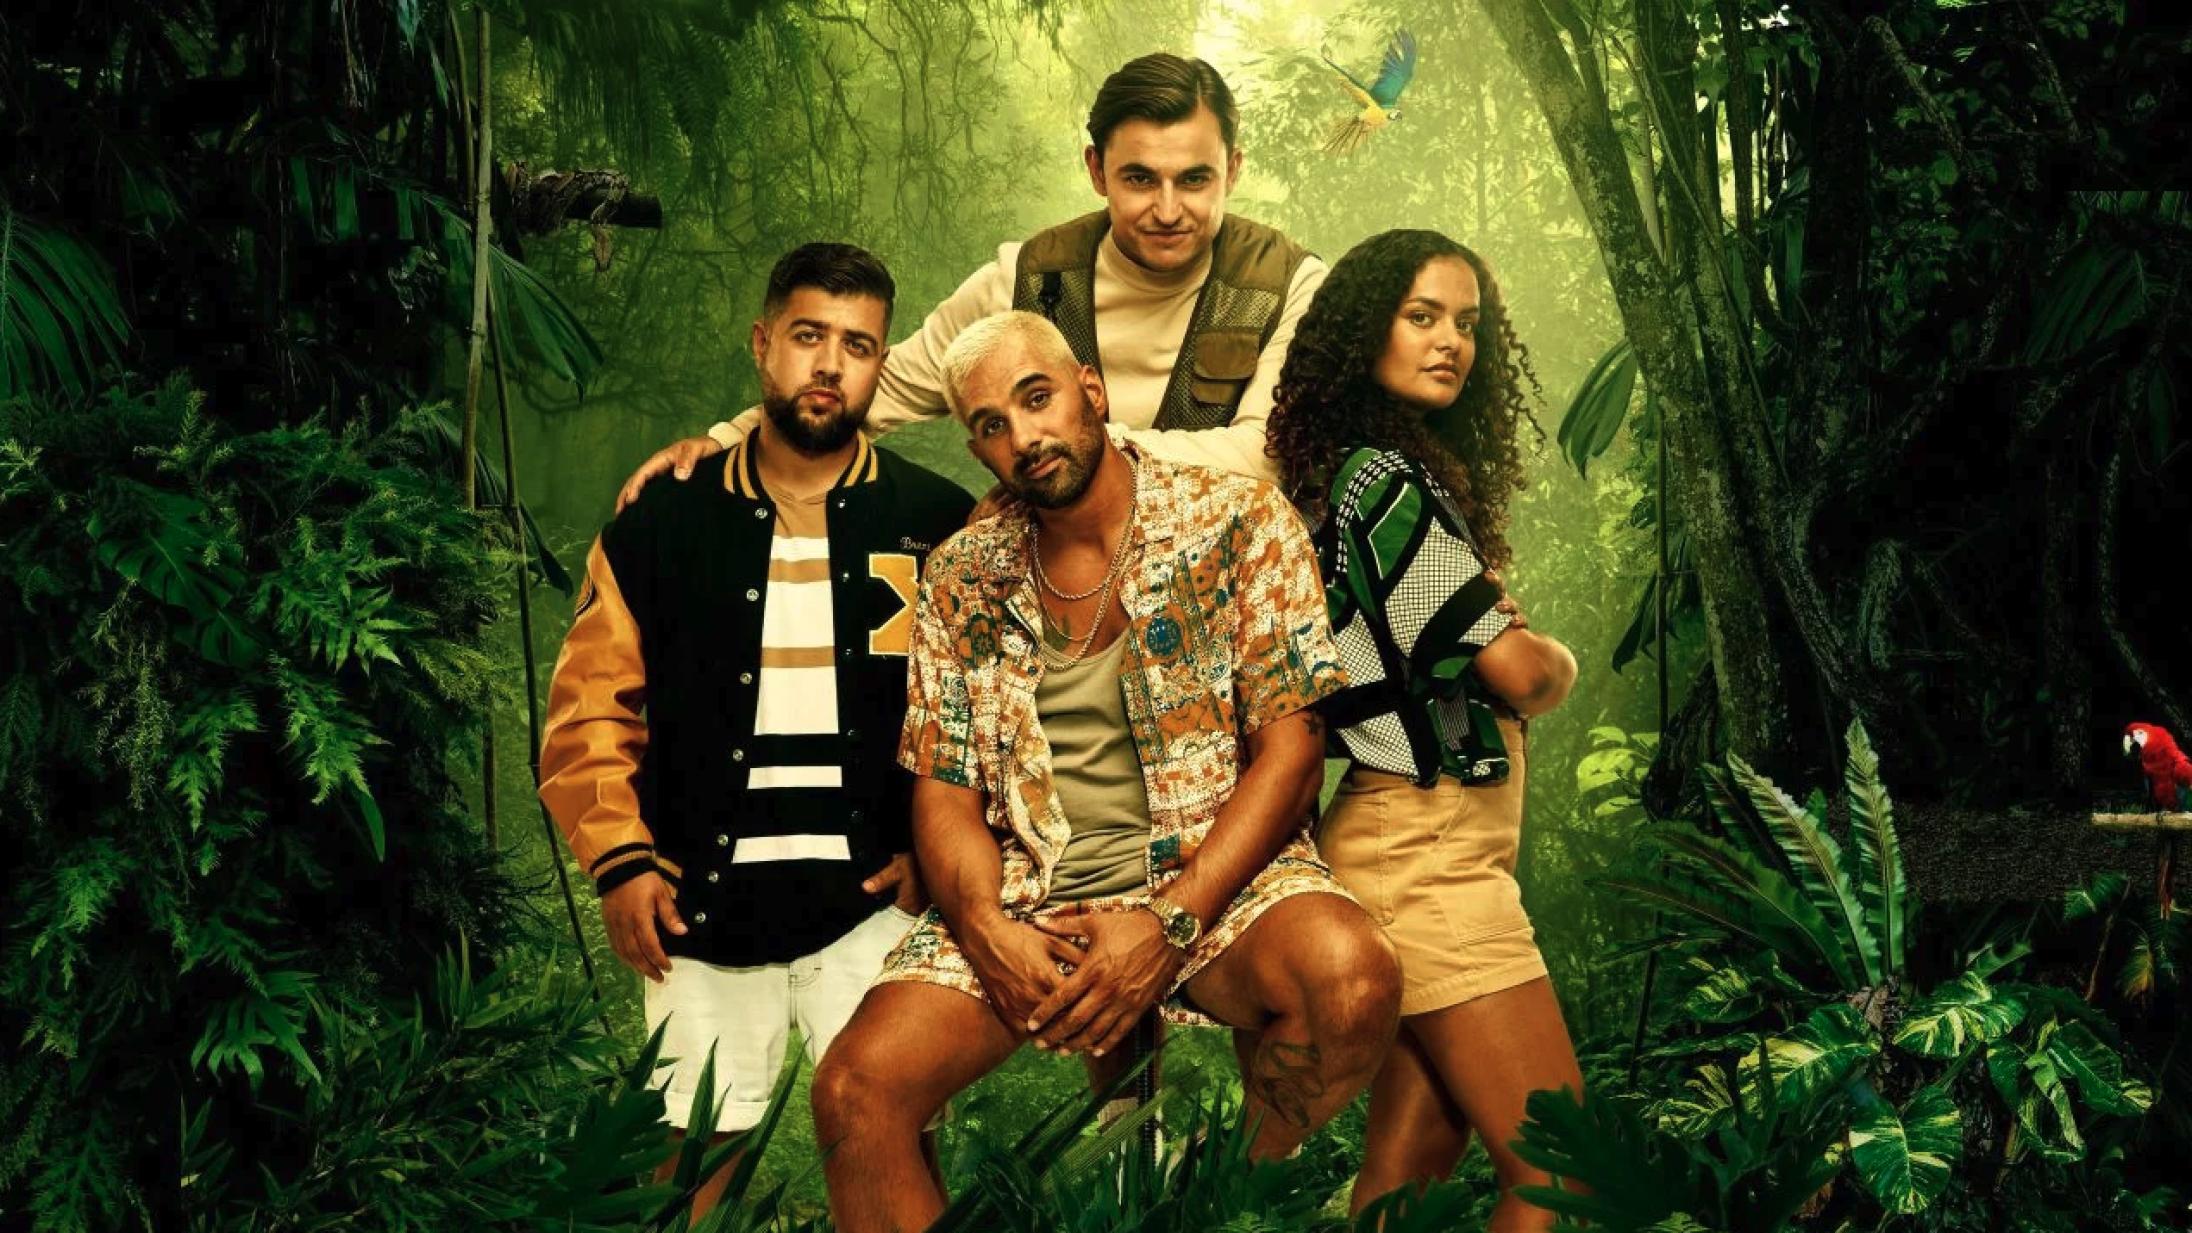 'Junglen': Zaki Youssefs lovende hangout-serie går en svær balancegang